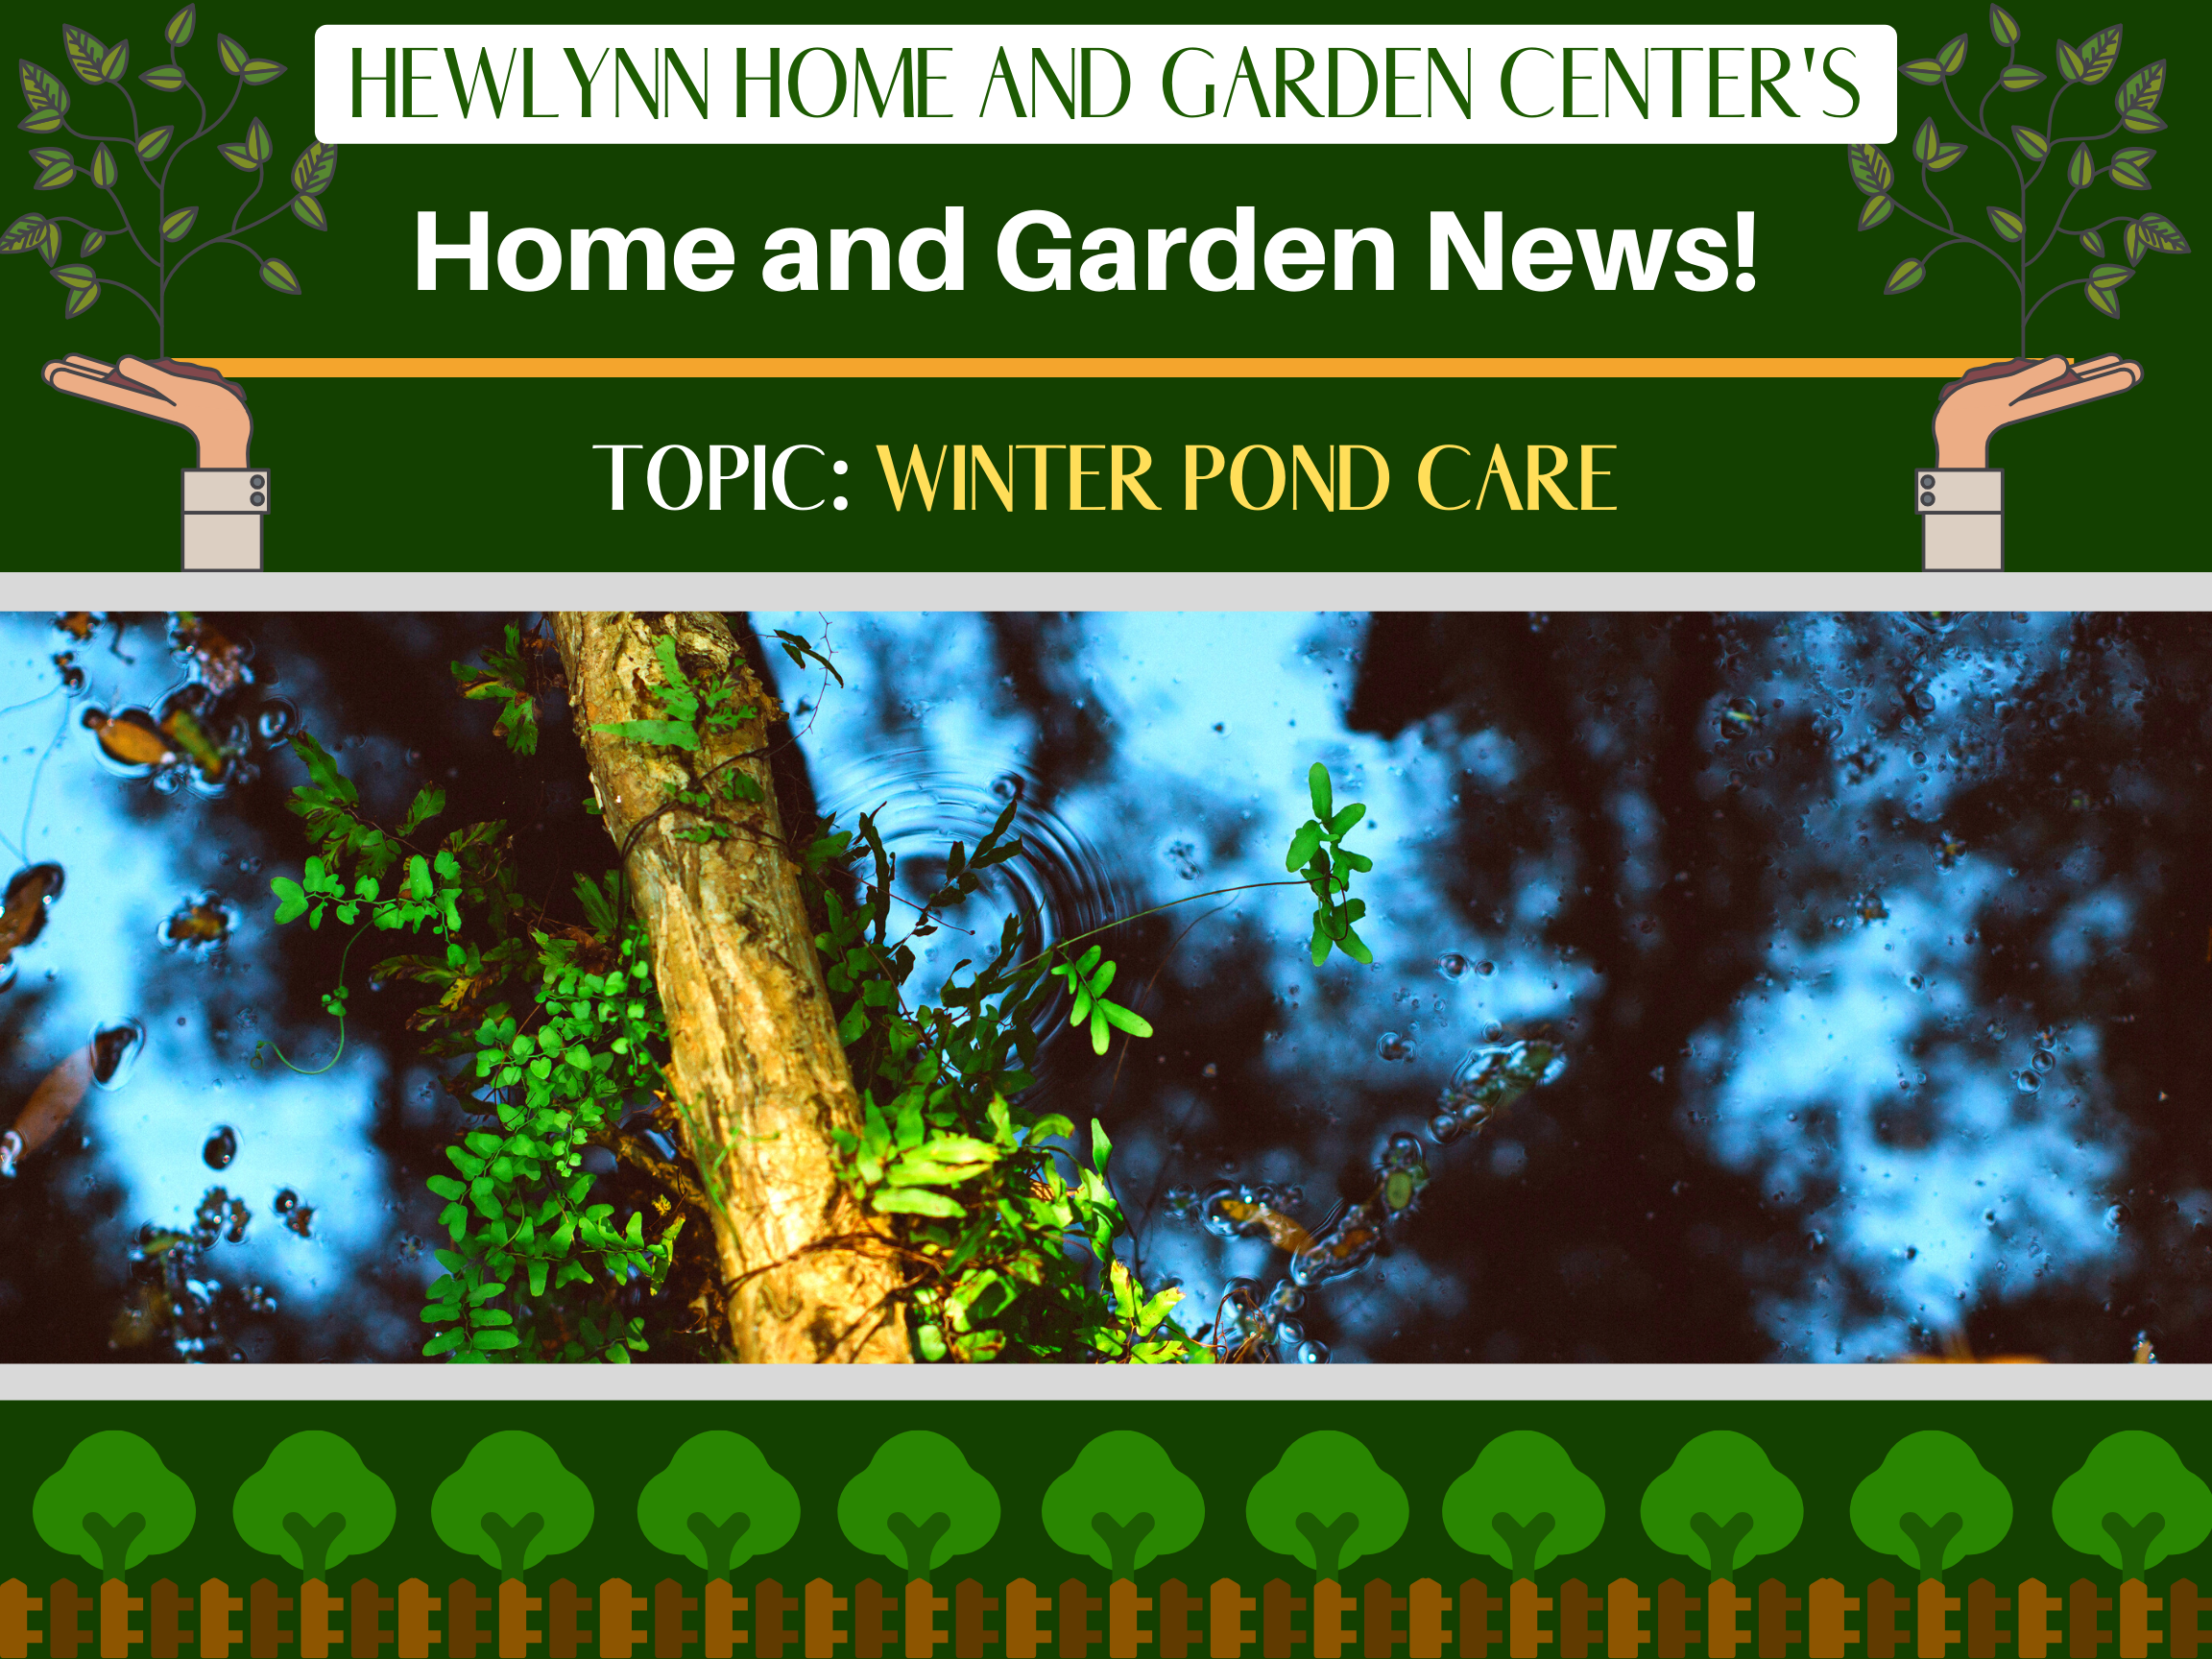 Hewlynn Home and Garden Center's